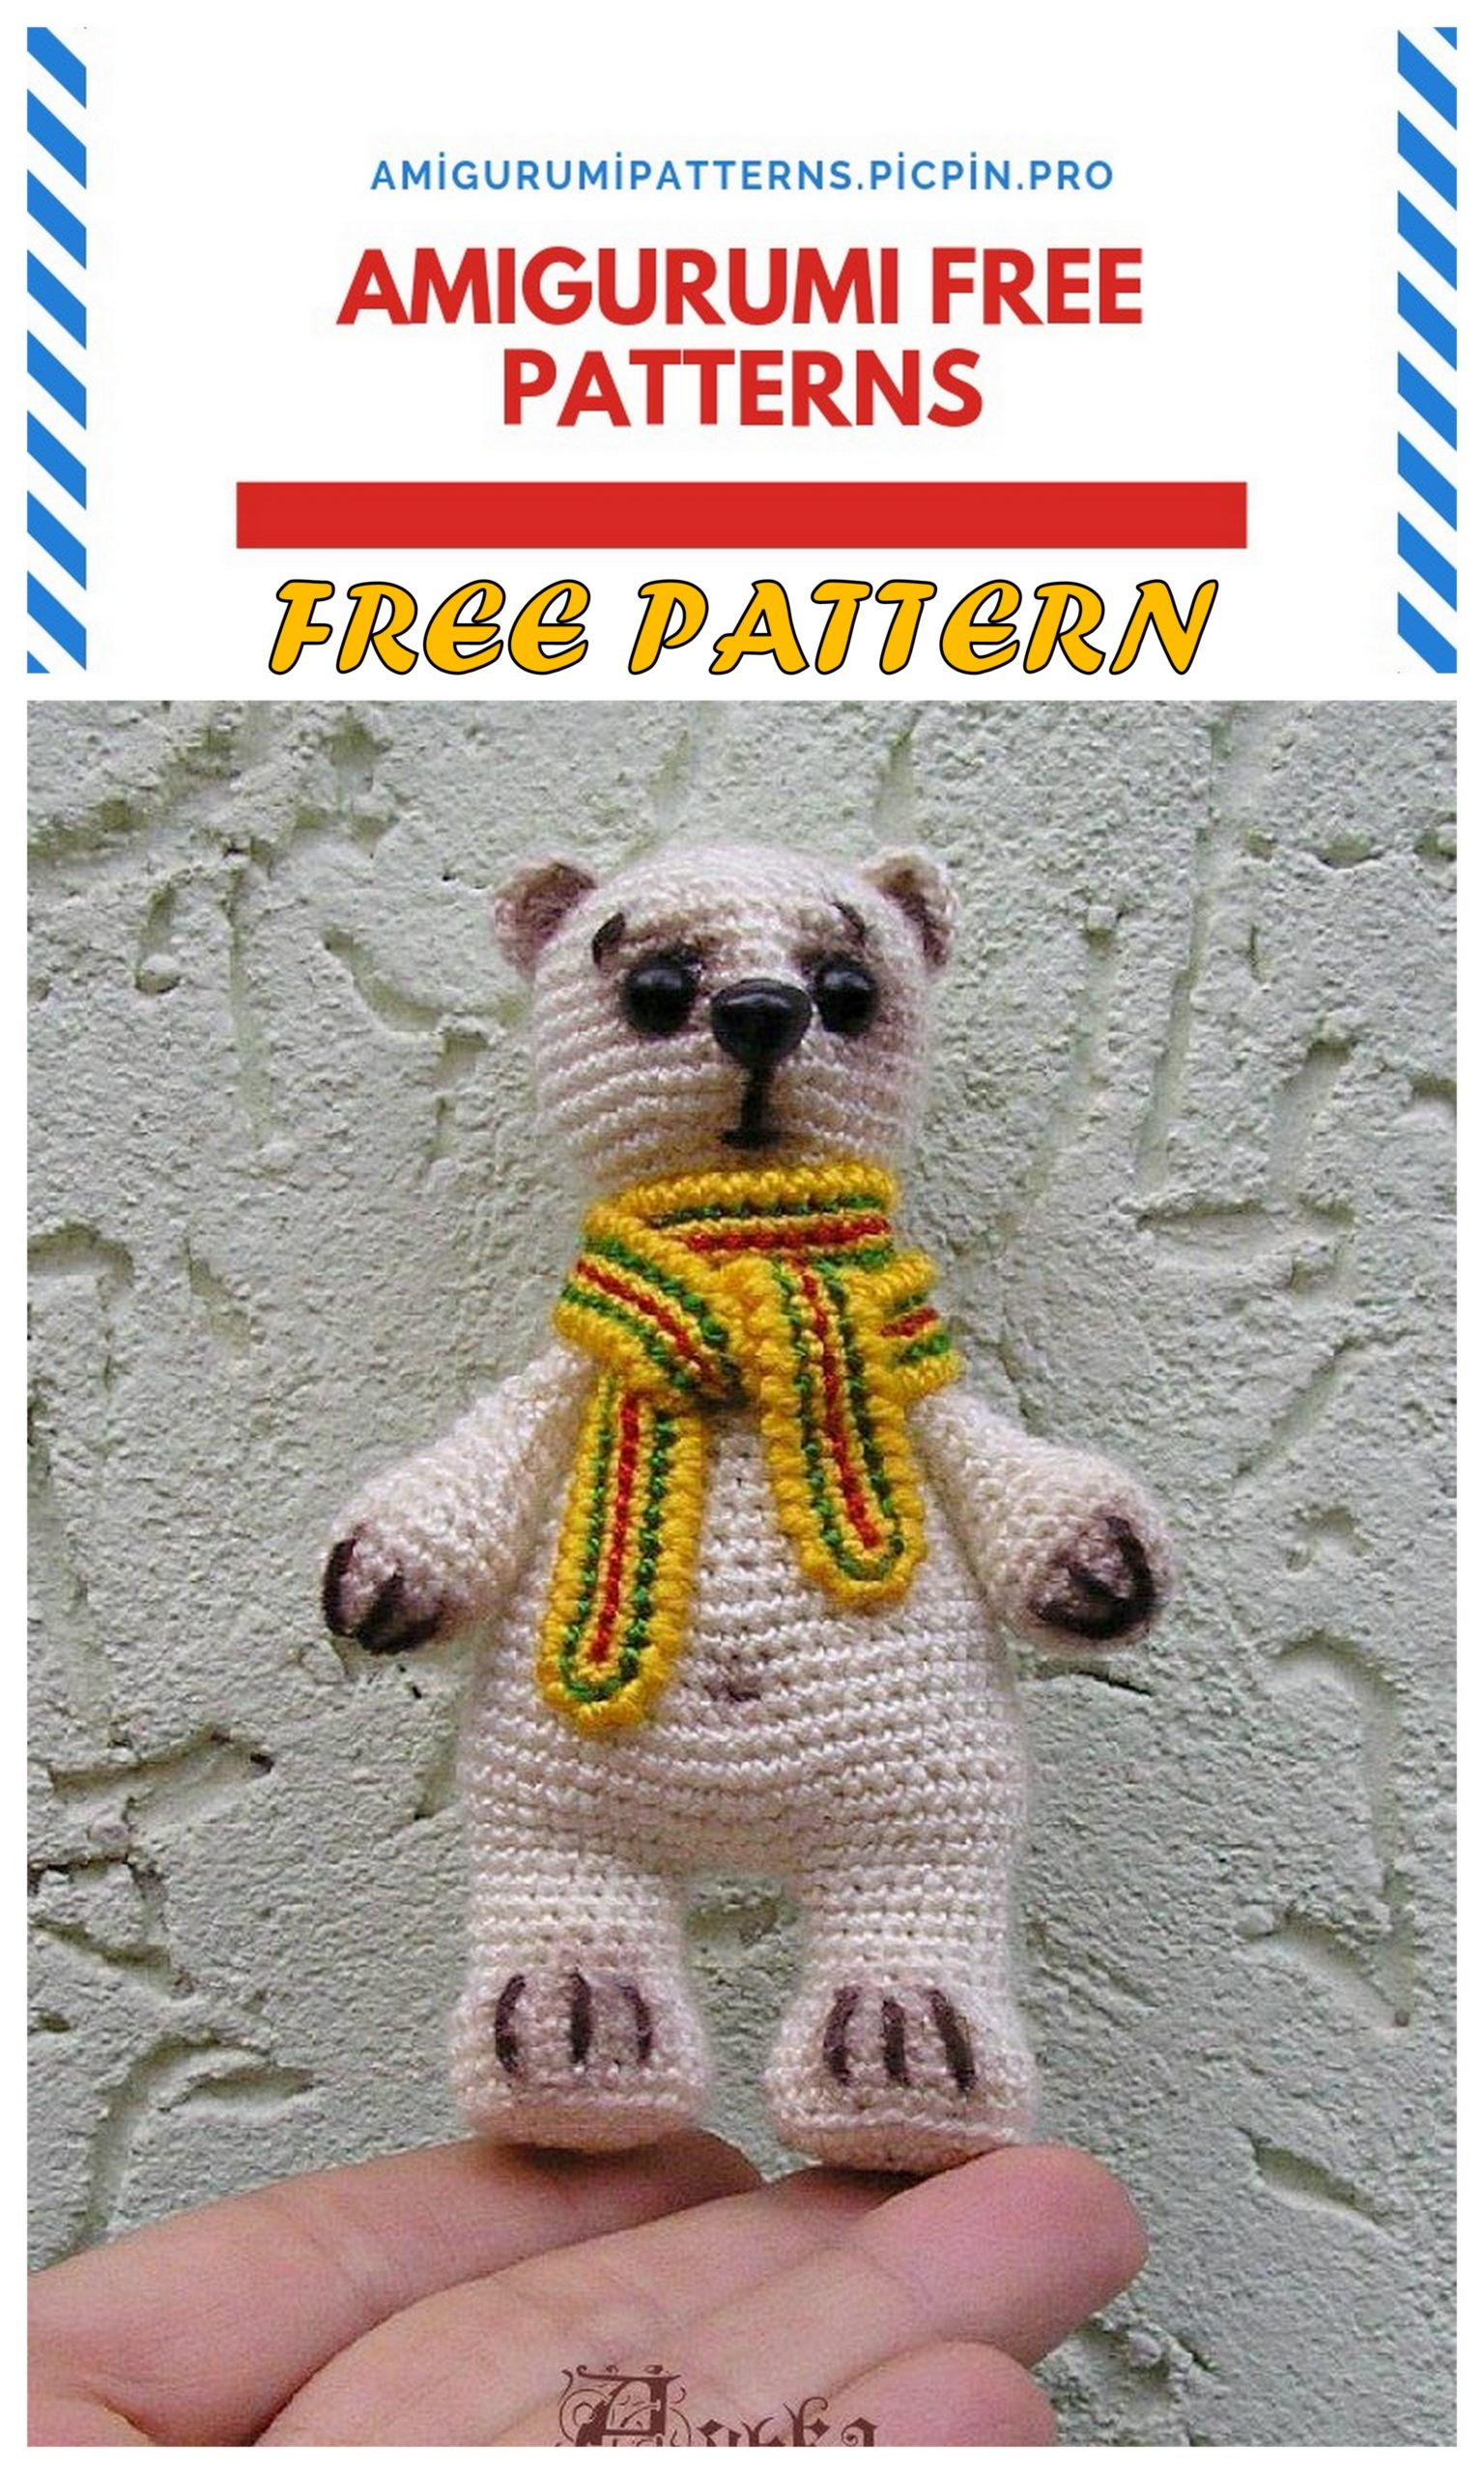 Amigurumi Crochet Teddy Bear Toys Free Patterns | 2560x1536